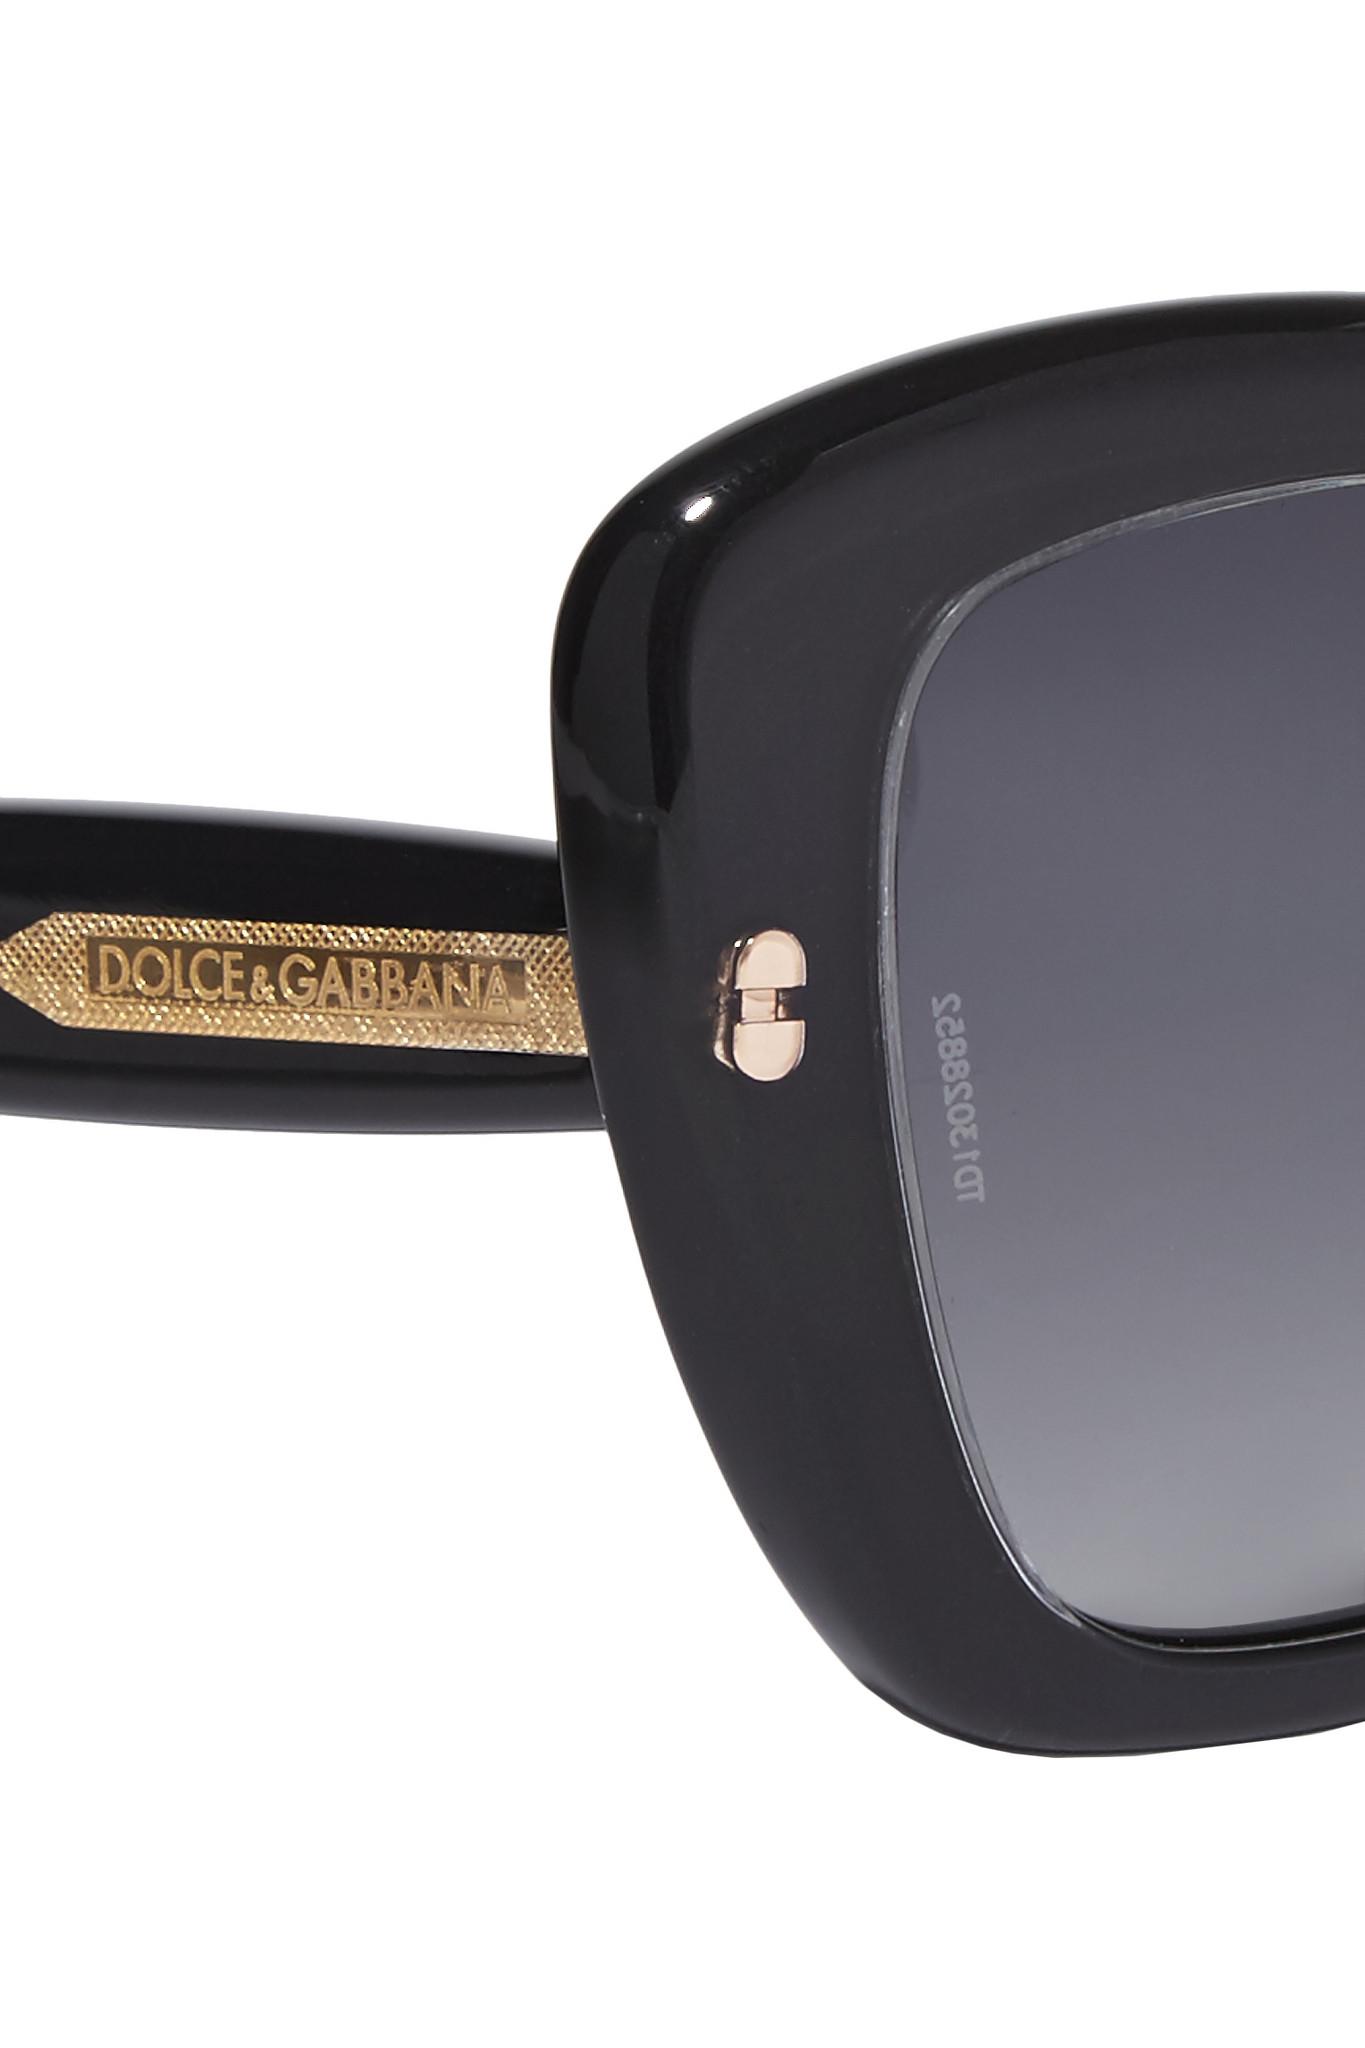 Dolce & Gabbana Square-frame Acetate Sunglasses in Black